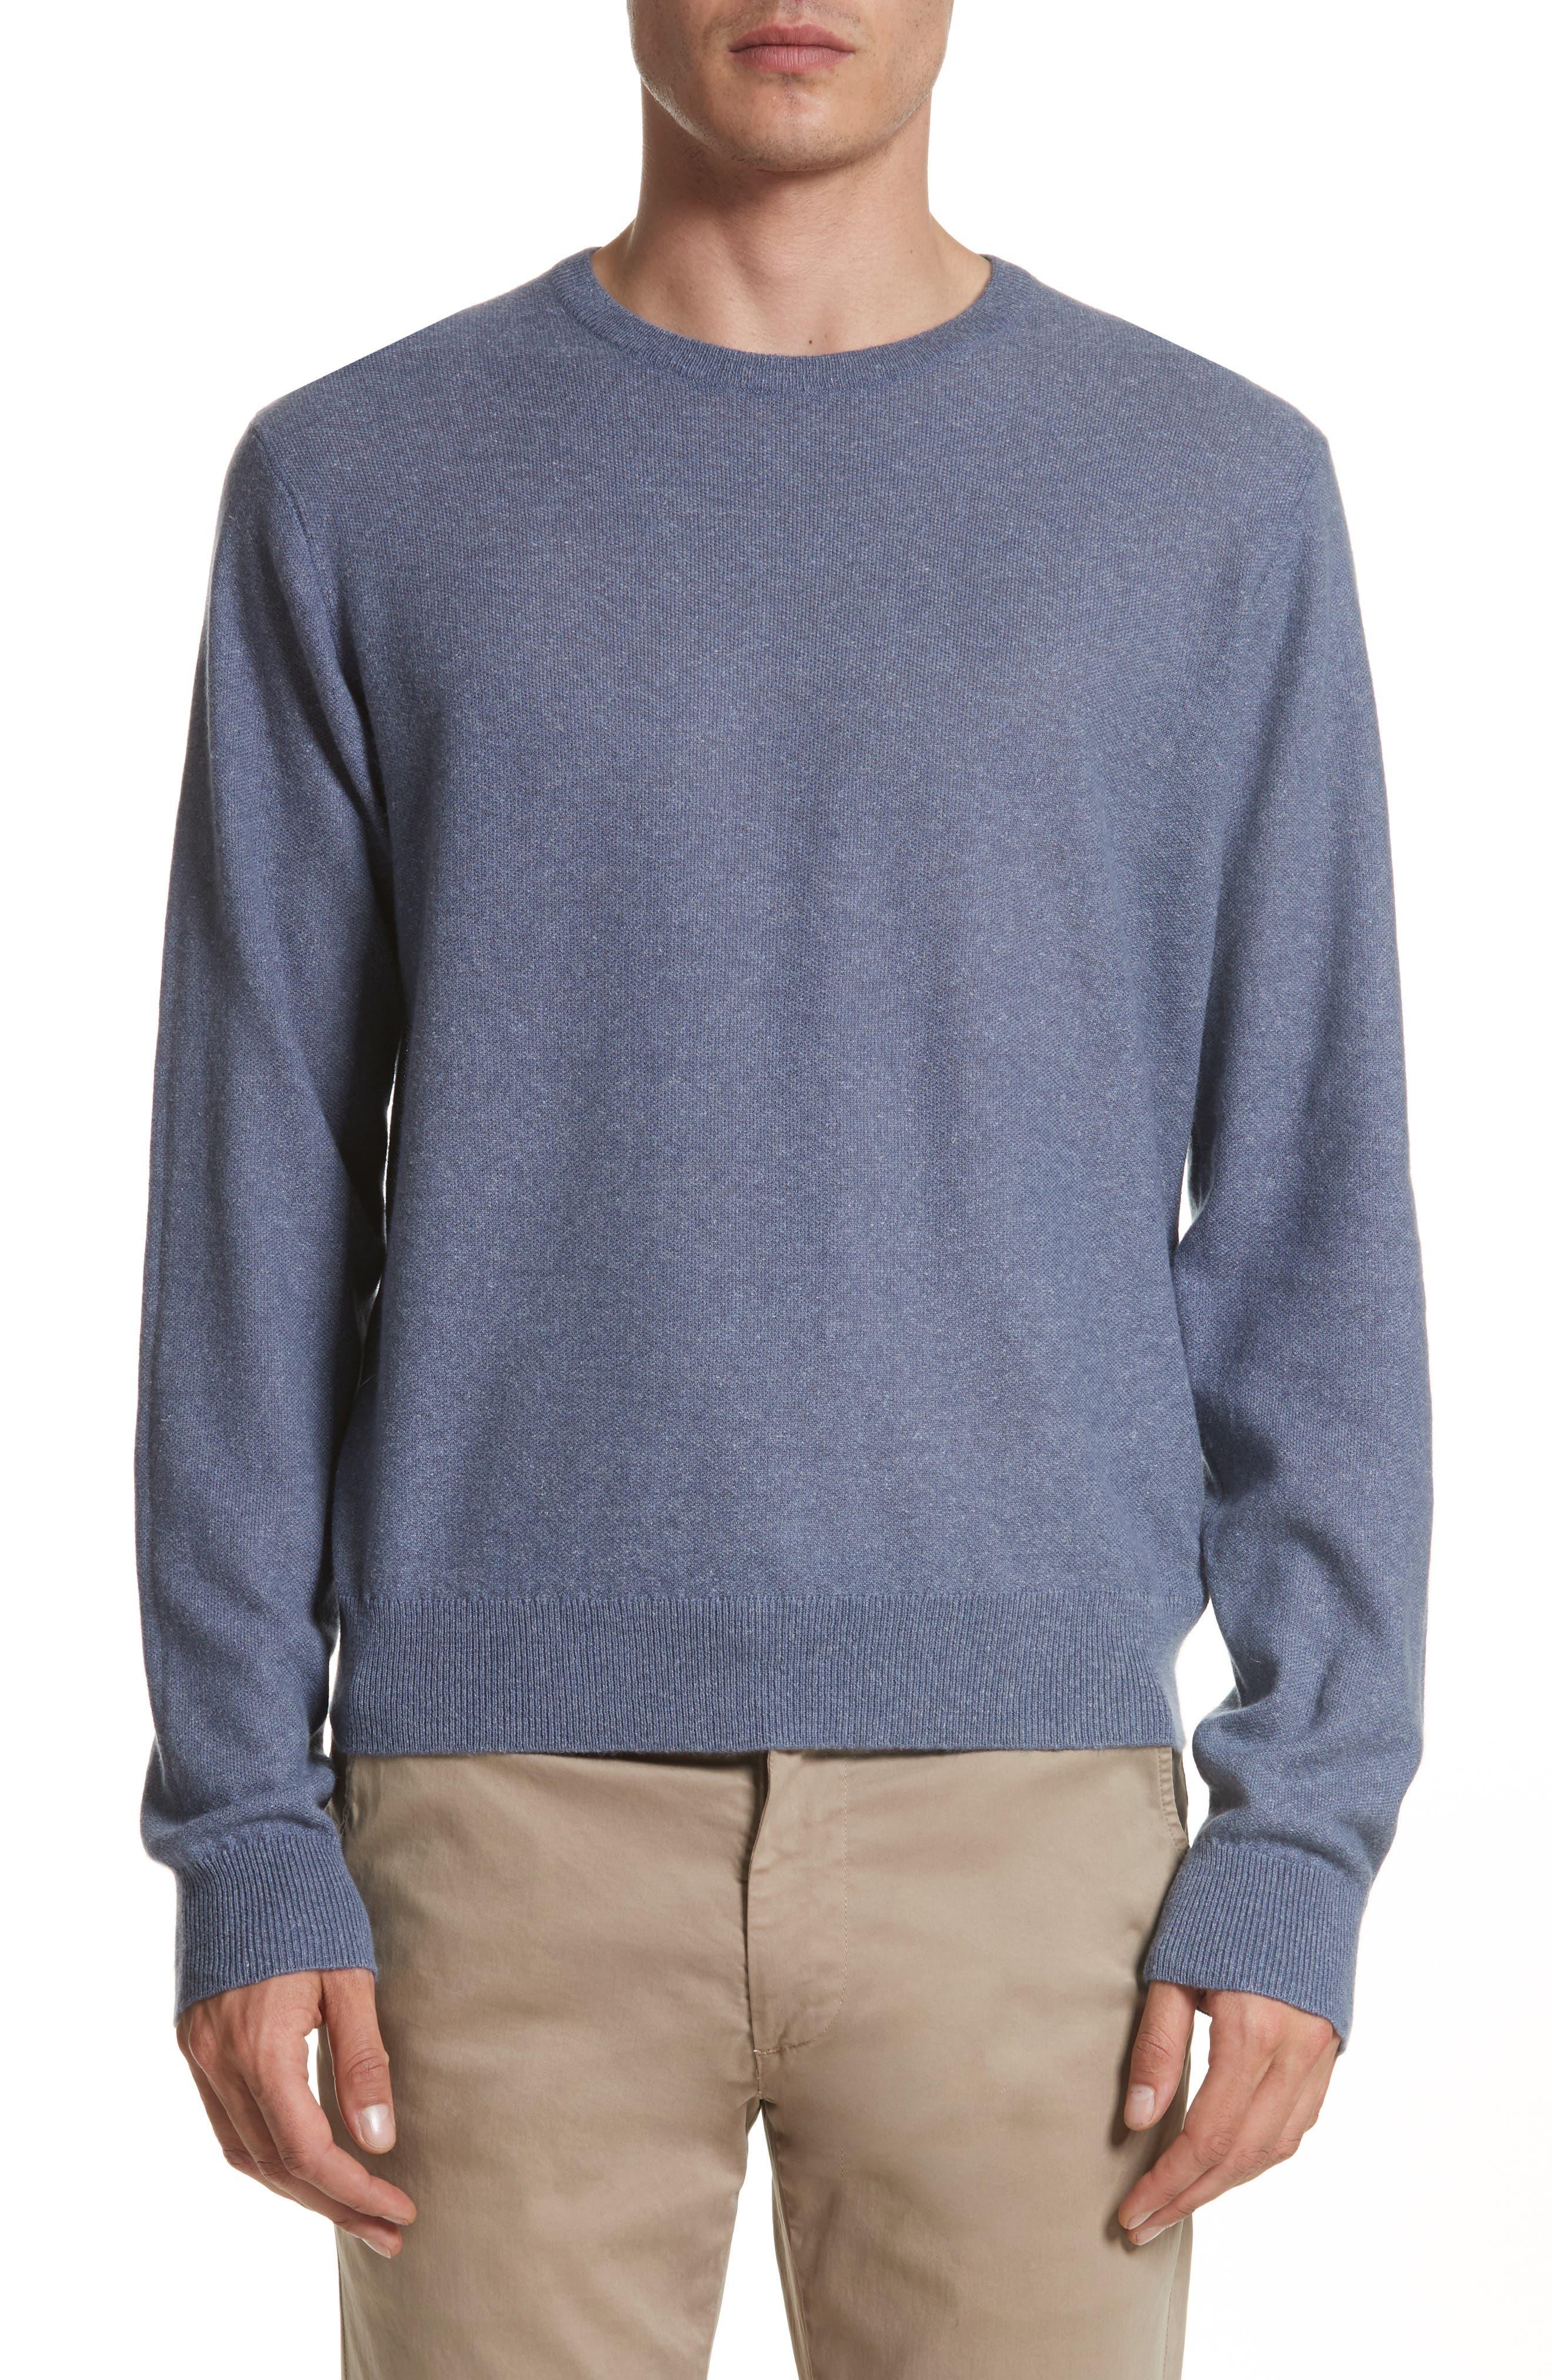 Todd Snyder Cashmere & Linen Crewneck Sweater